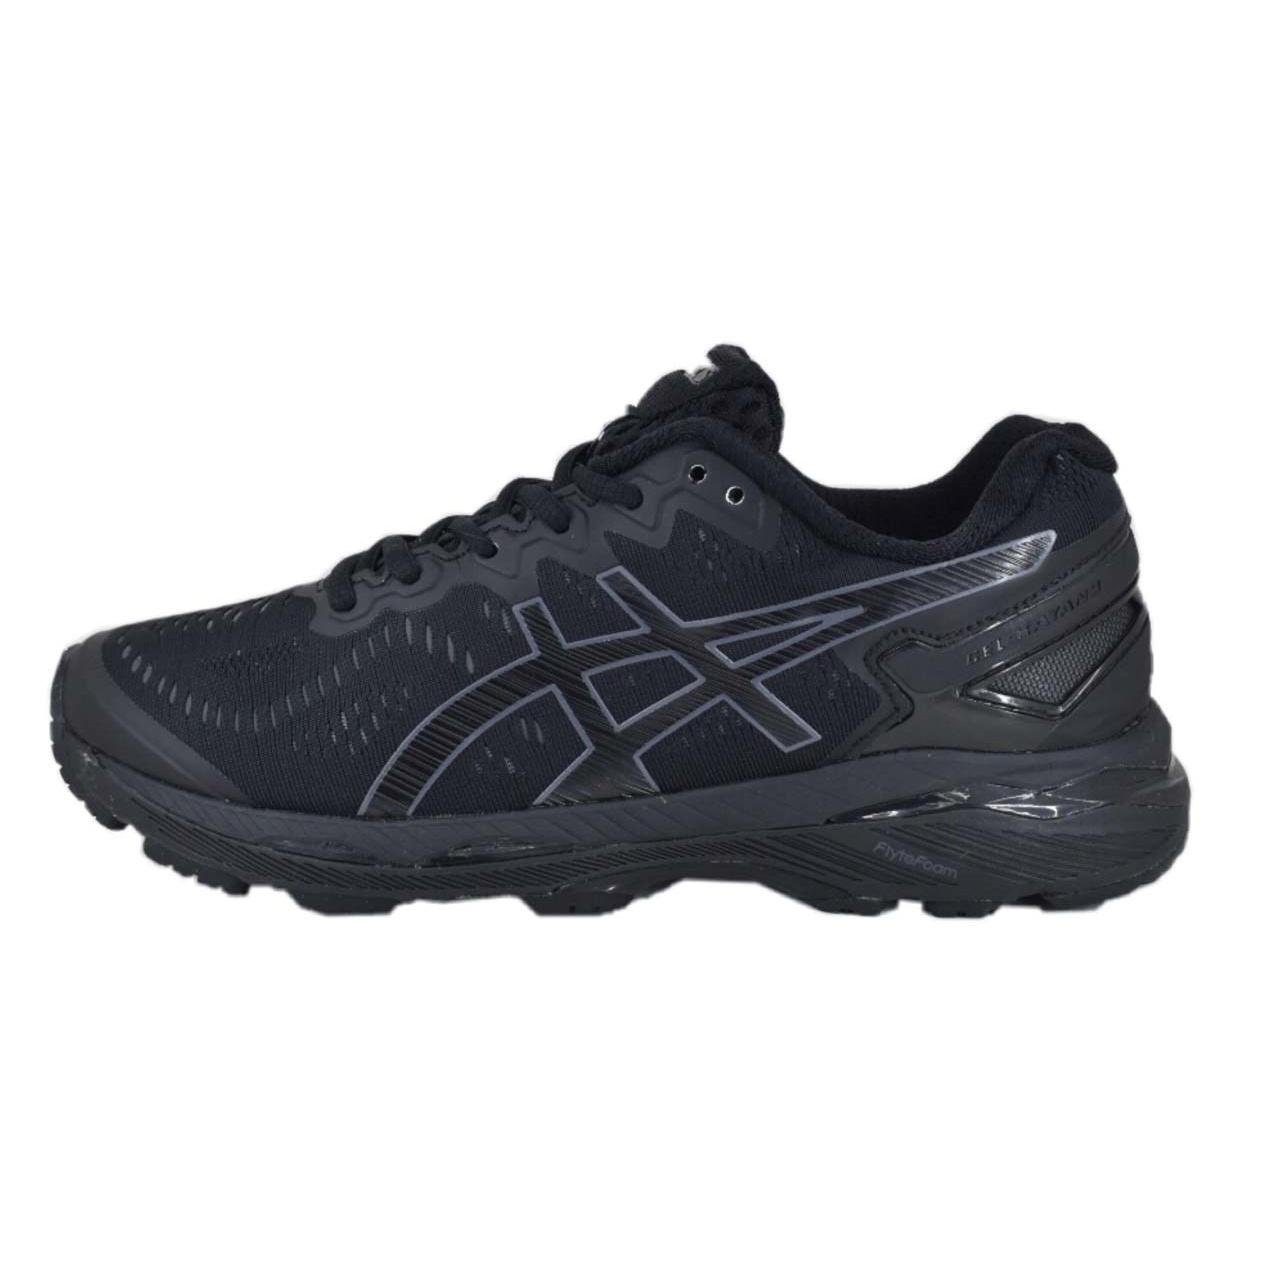 کفش مخصوص دویدن مردانه اسیکس مدل GEL-Kayano 23